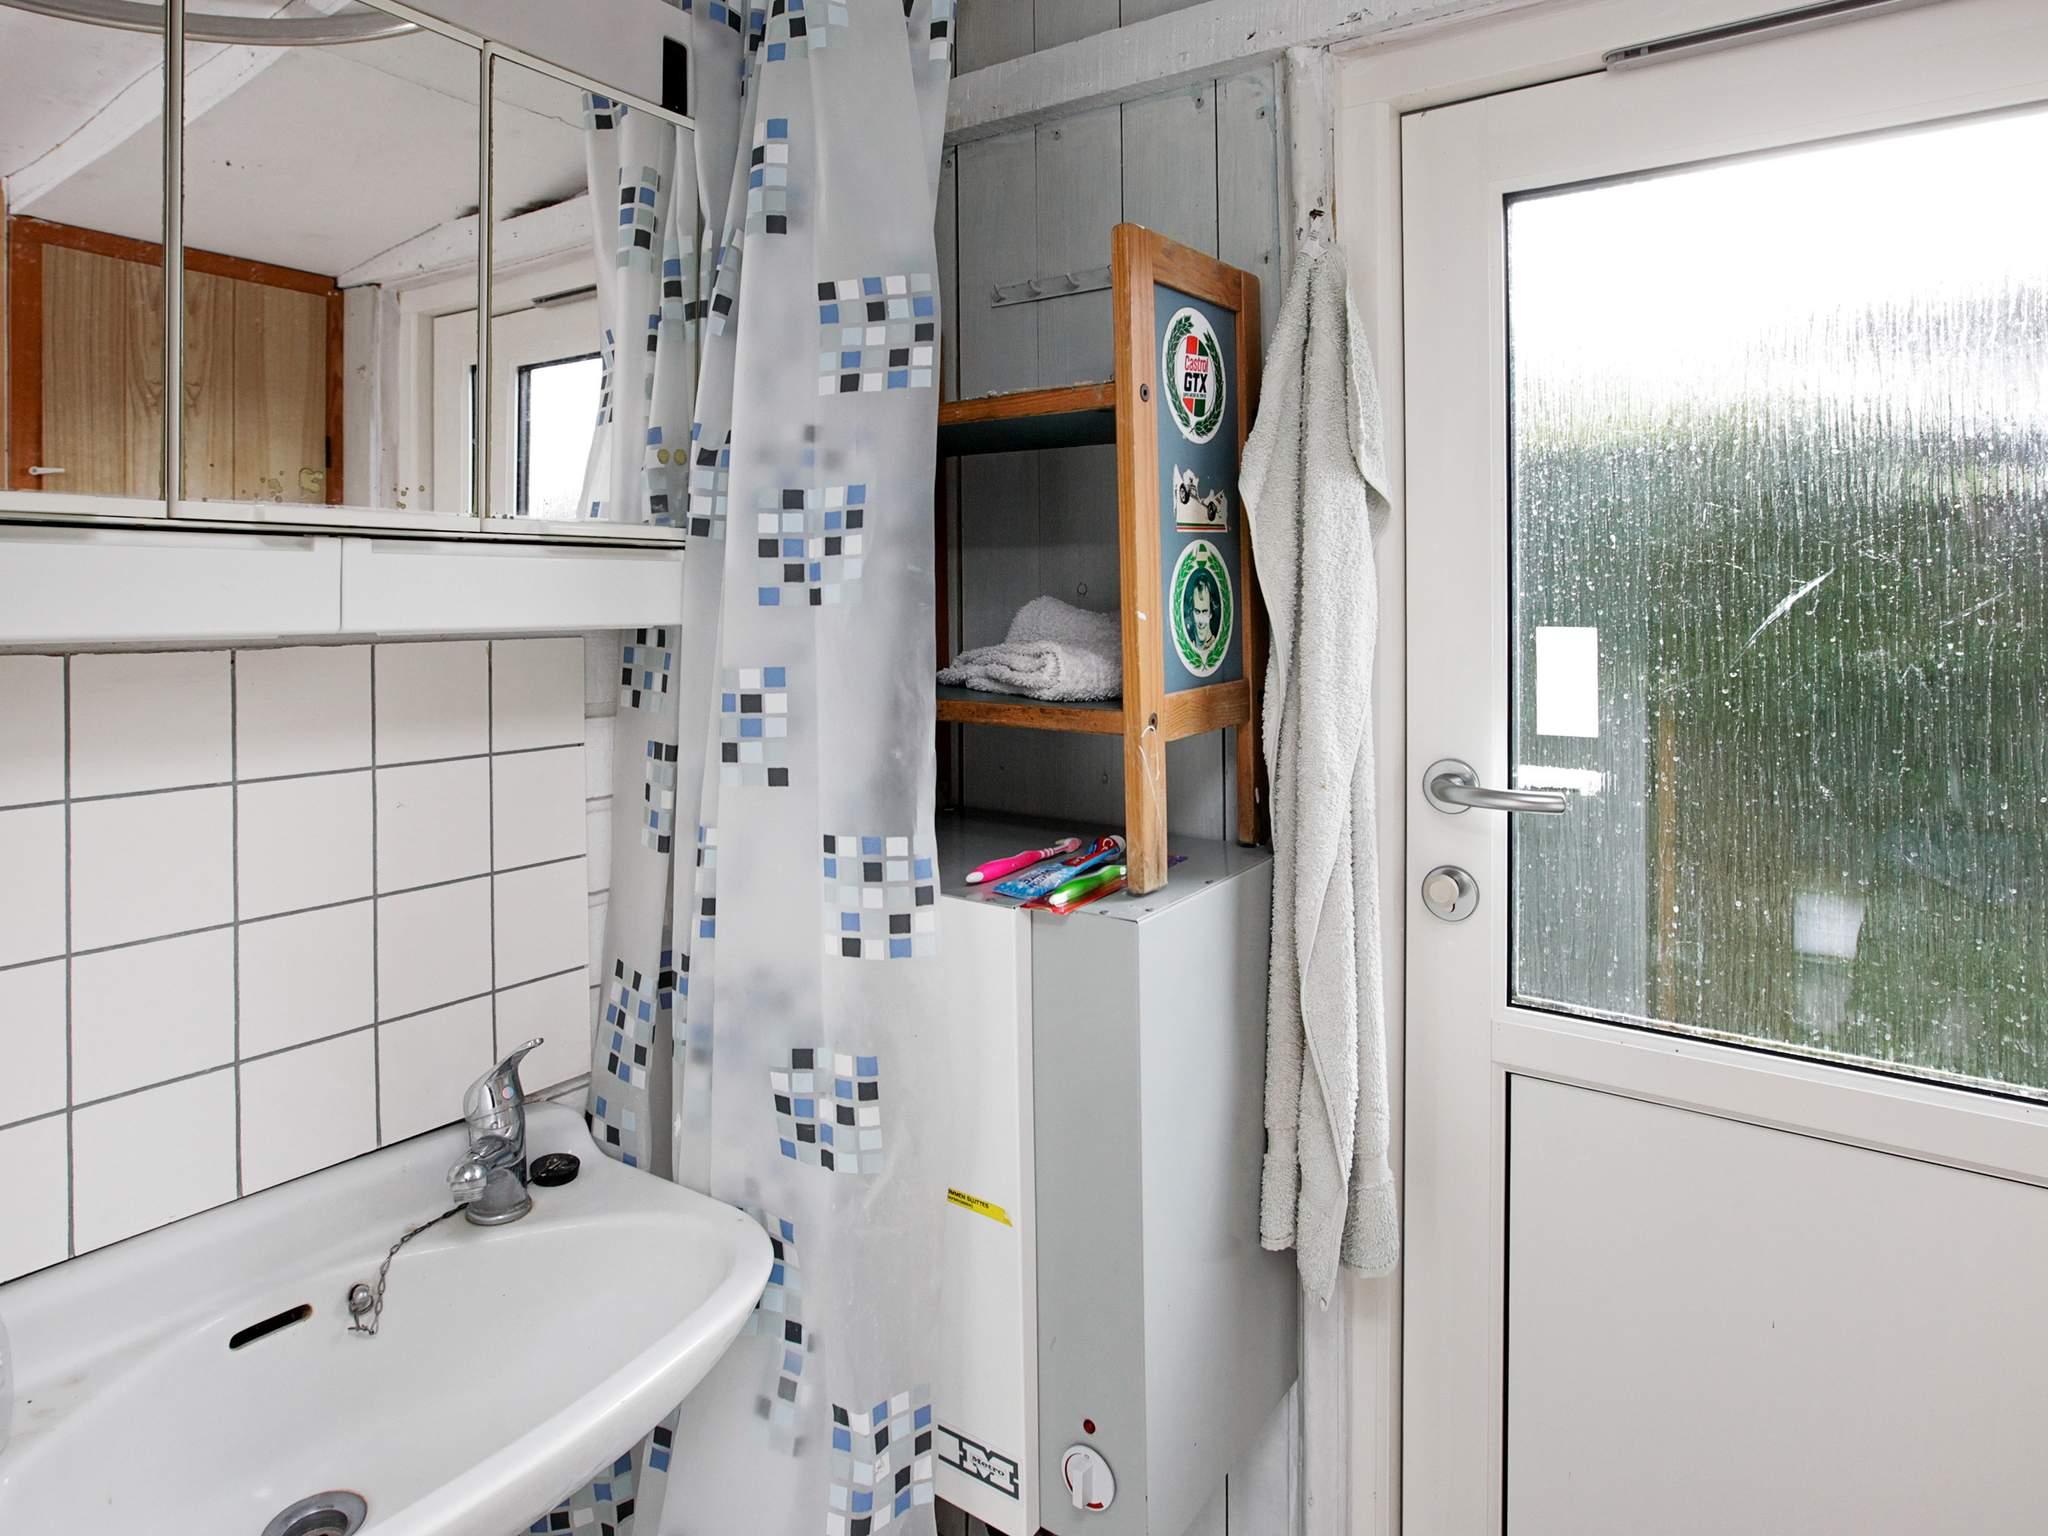 Maison de vacances Hasmark (1723417), Hasmark, , Fionie, Danemark, image 6